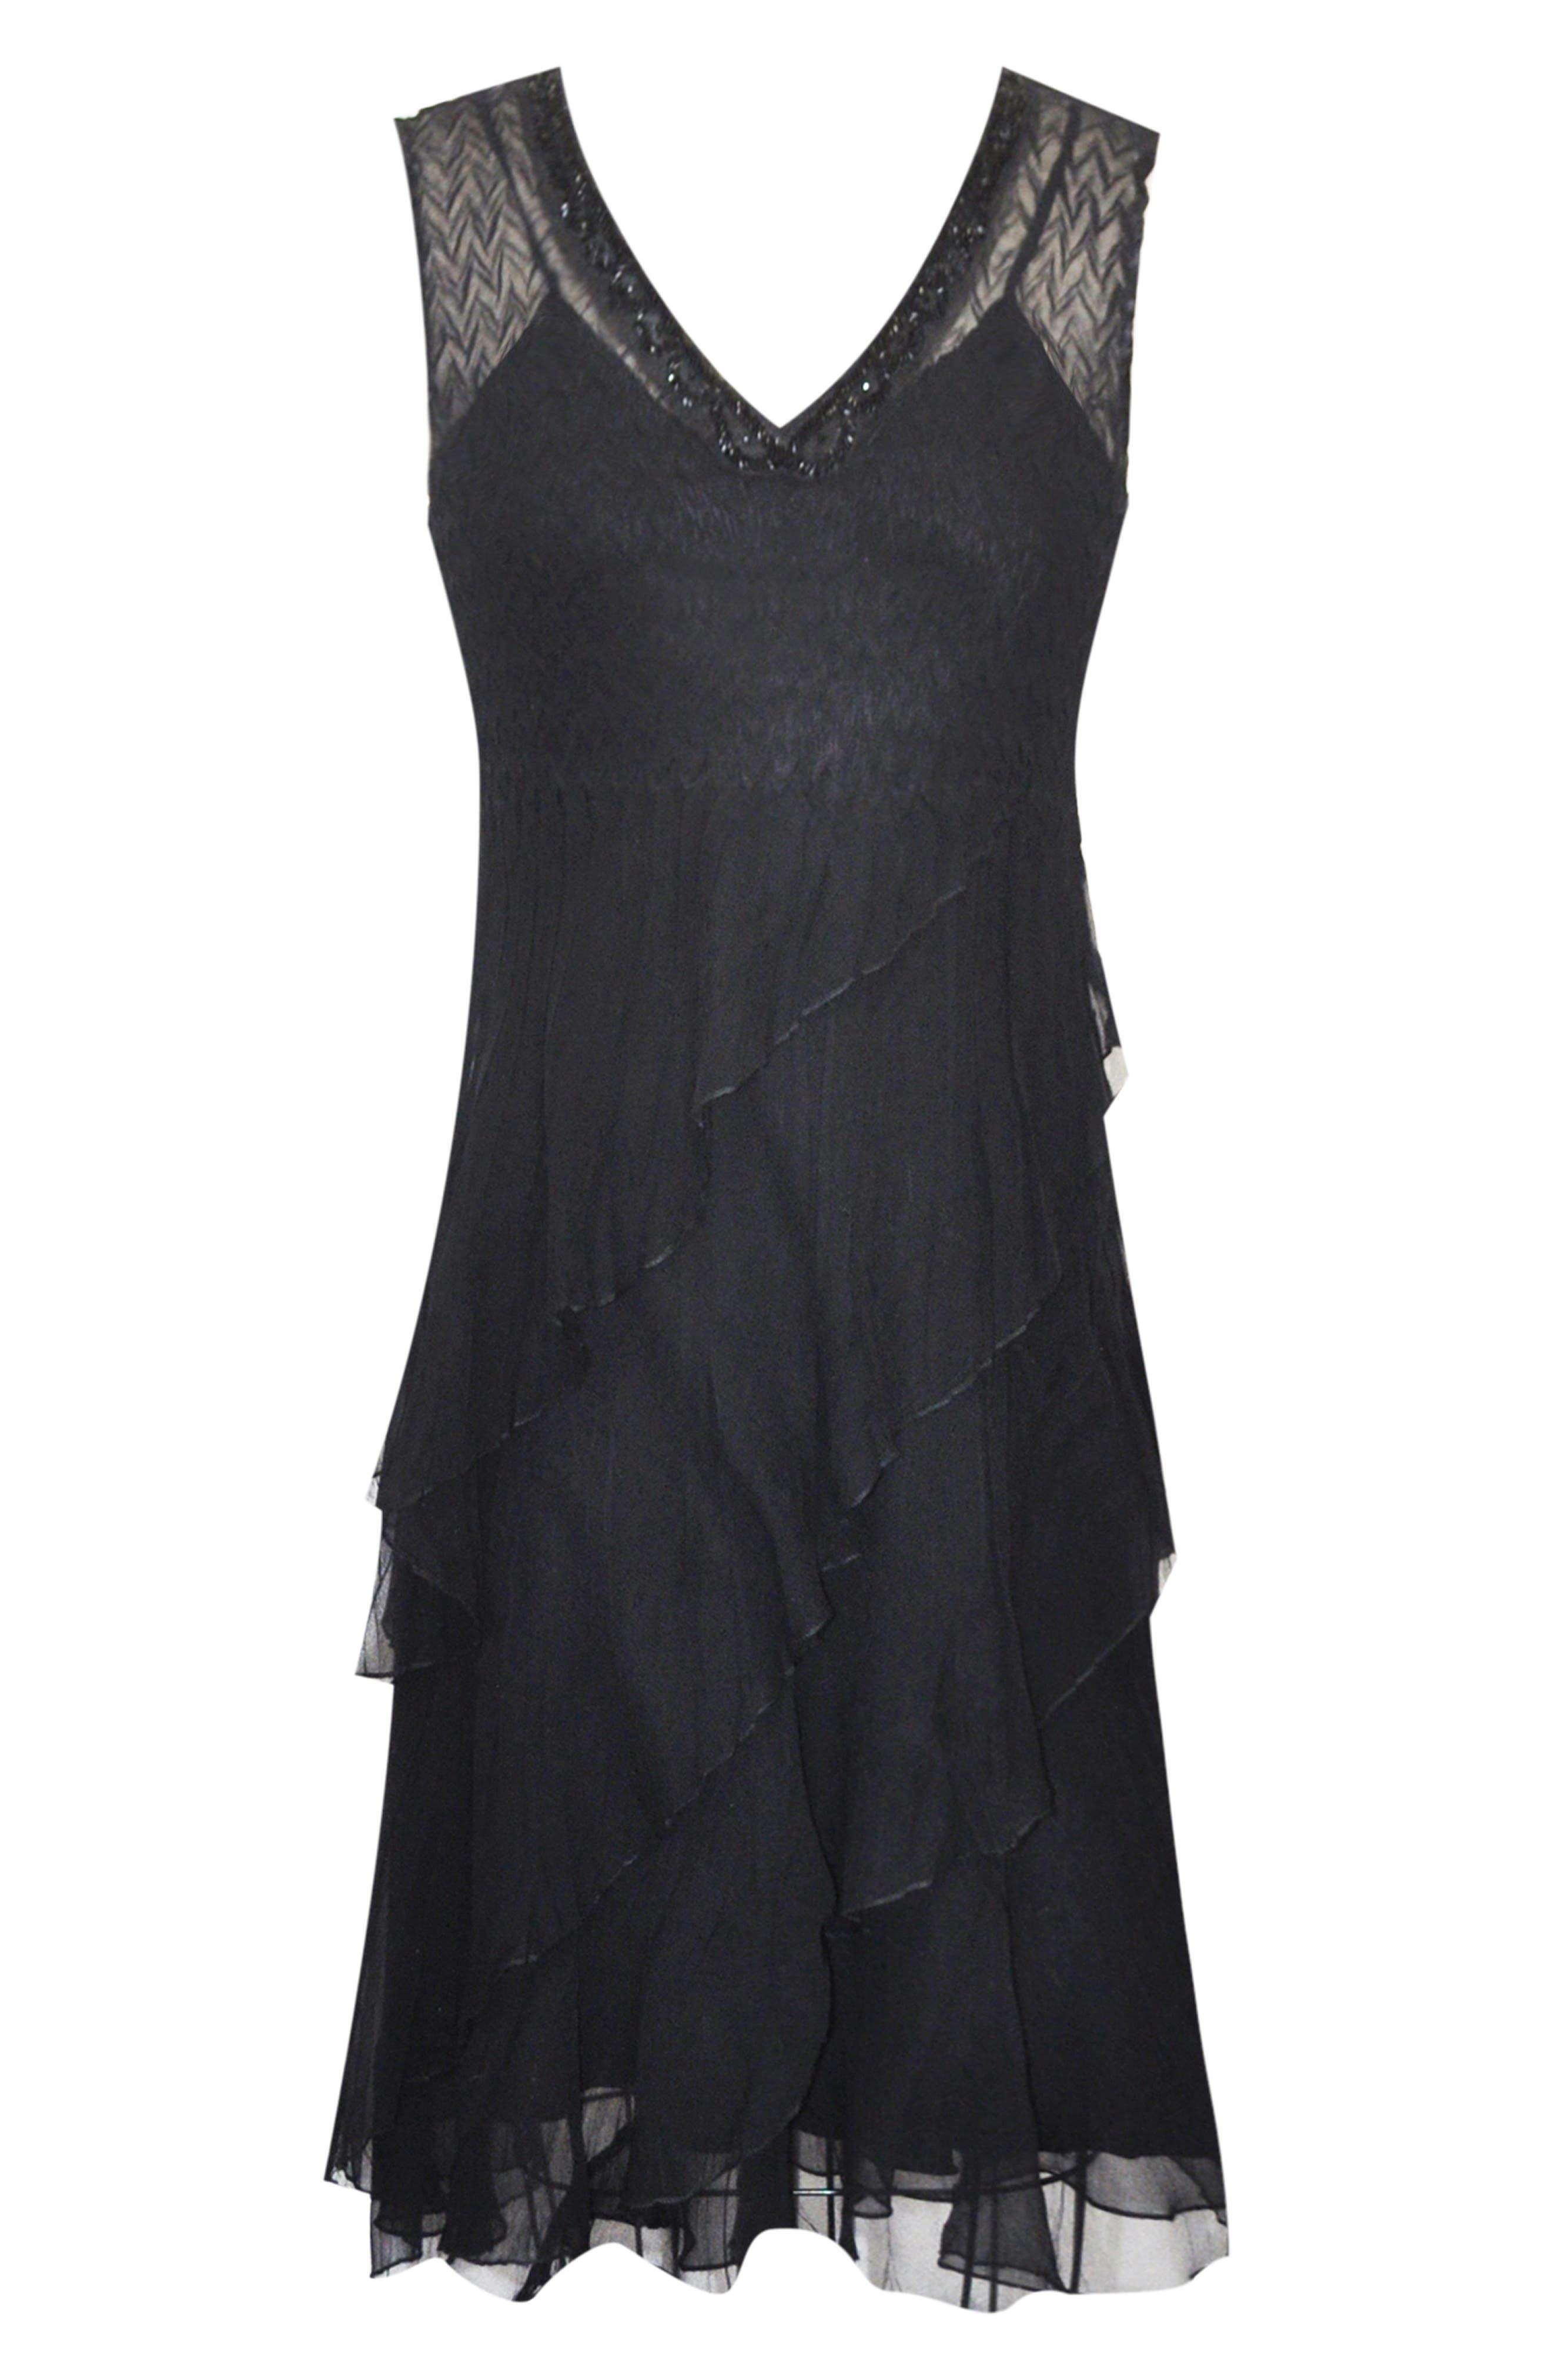 KOMAROV, Bead Trim Chiffon Dress with Wrap, Alternate thumbnail 7, color, BLACK